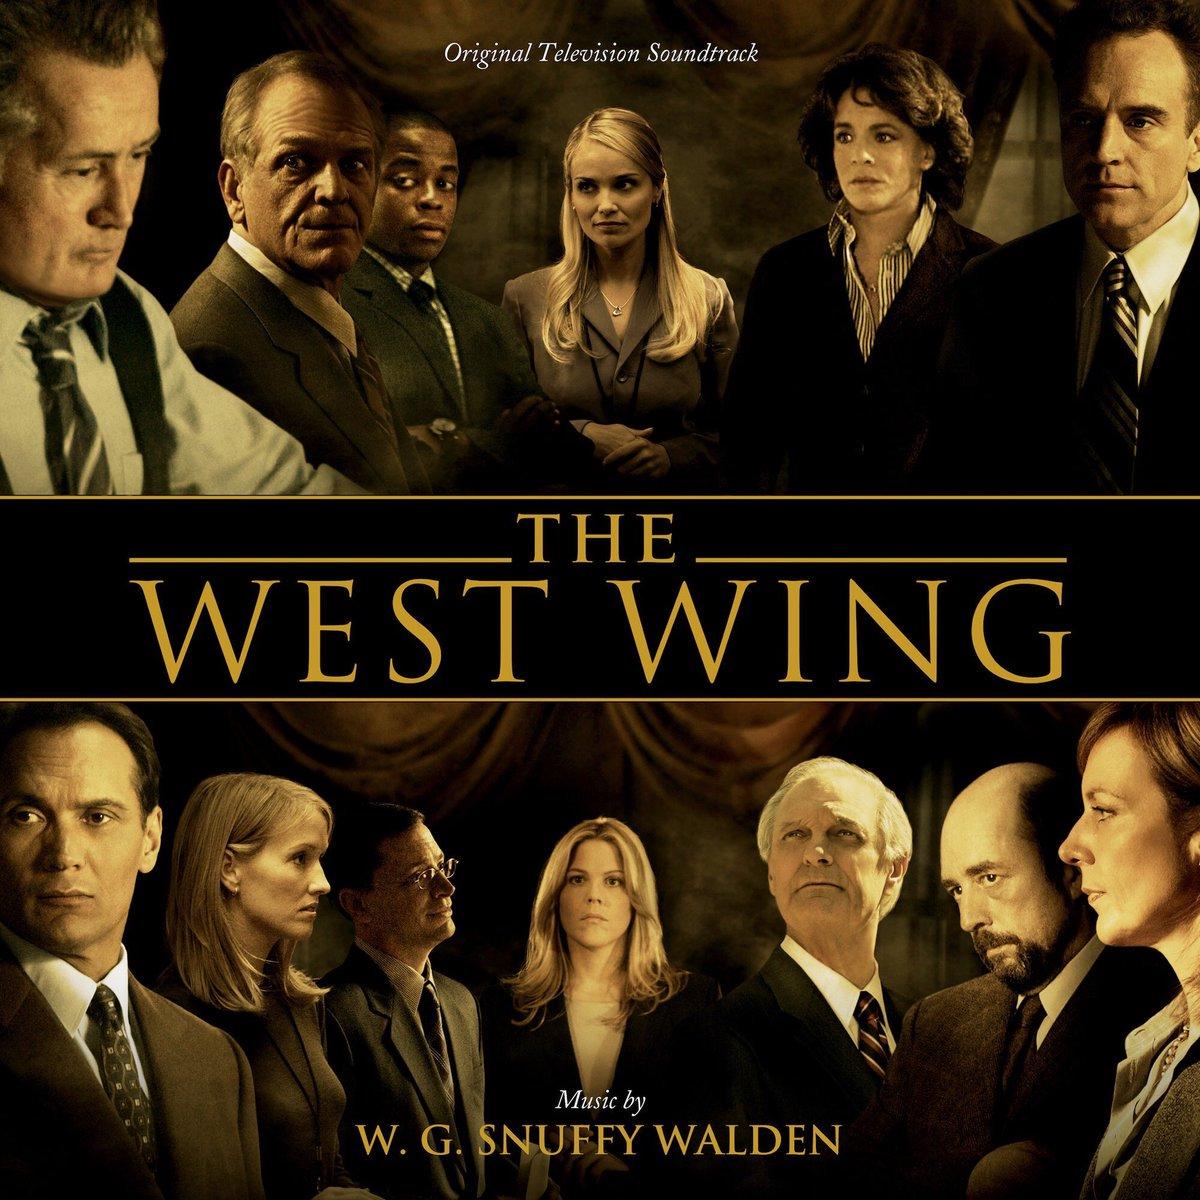 Soundtrack net soundtracknet twitter - The west wing ...